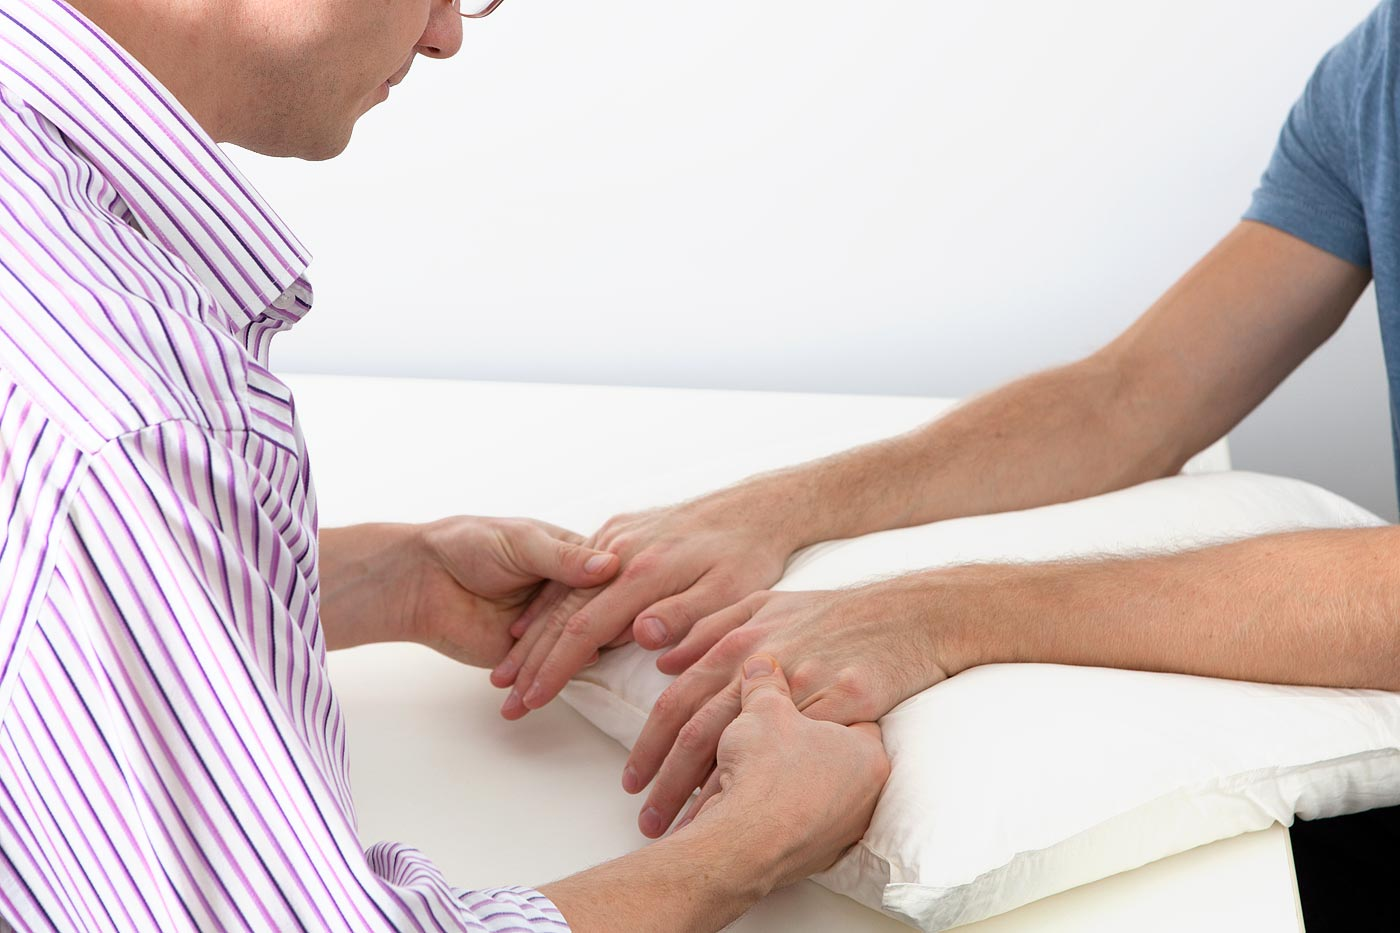 Inspect the patients hands